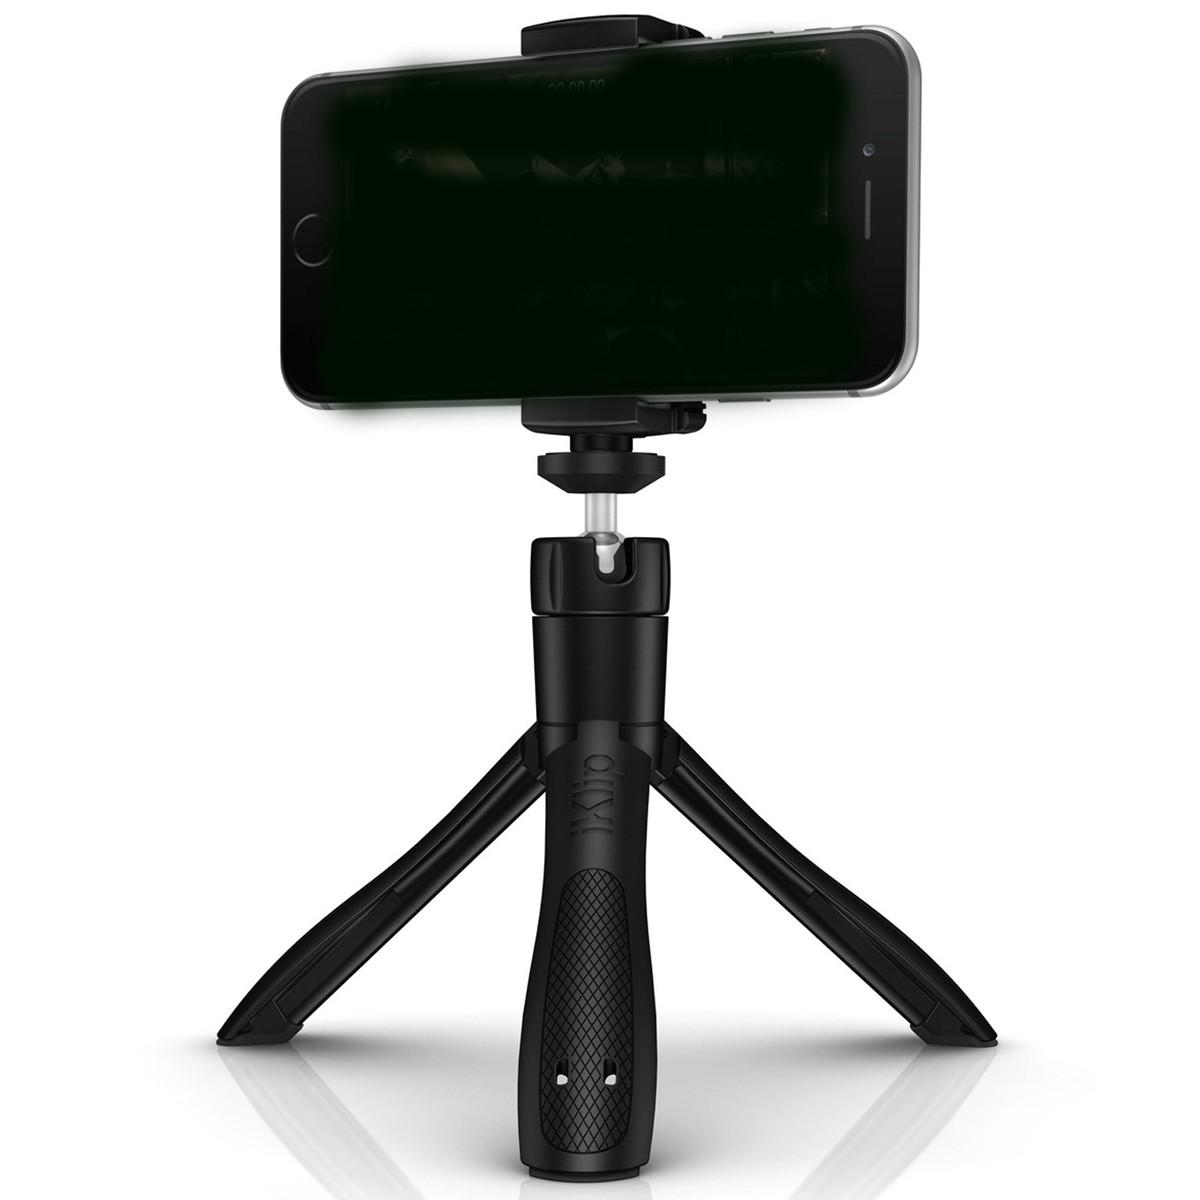 Image of IK Multimedia iKlip Grip Stand Selfie-Stick with Bluetooth